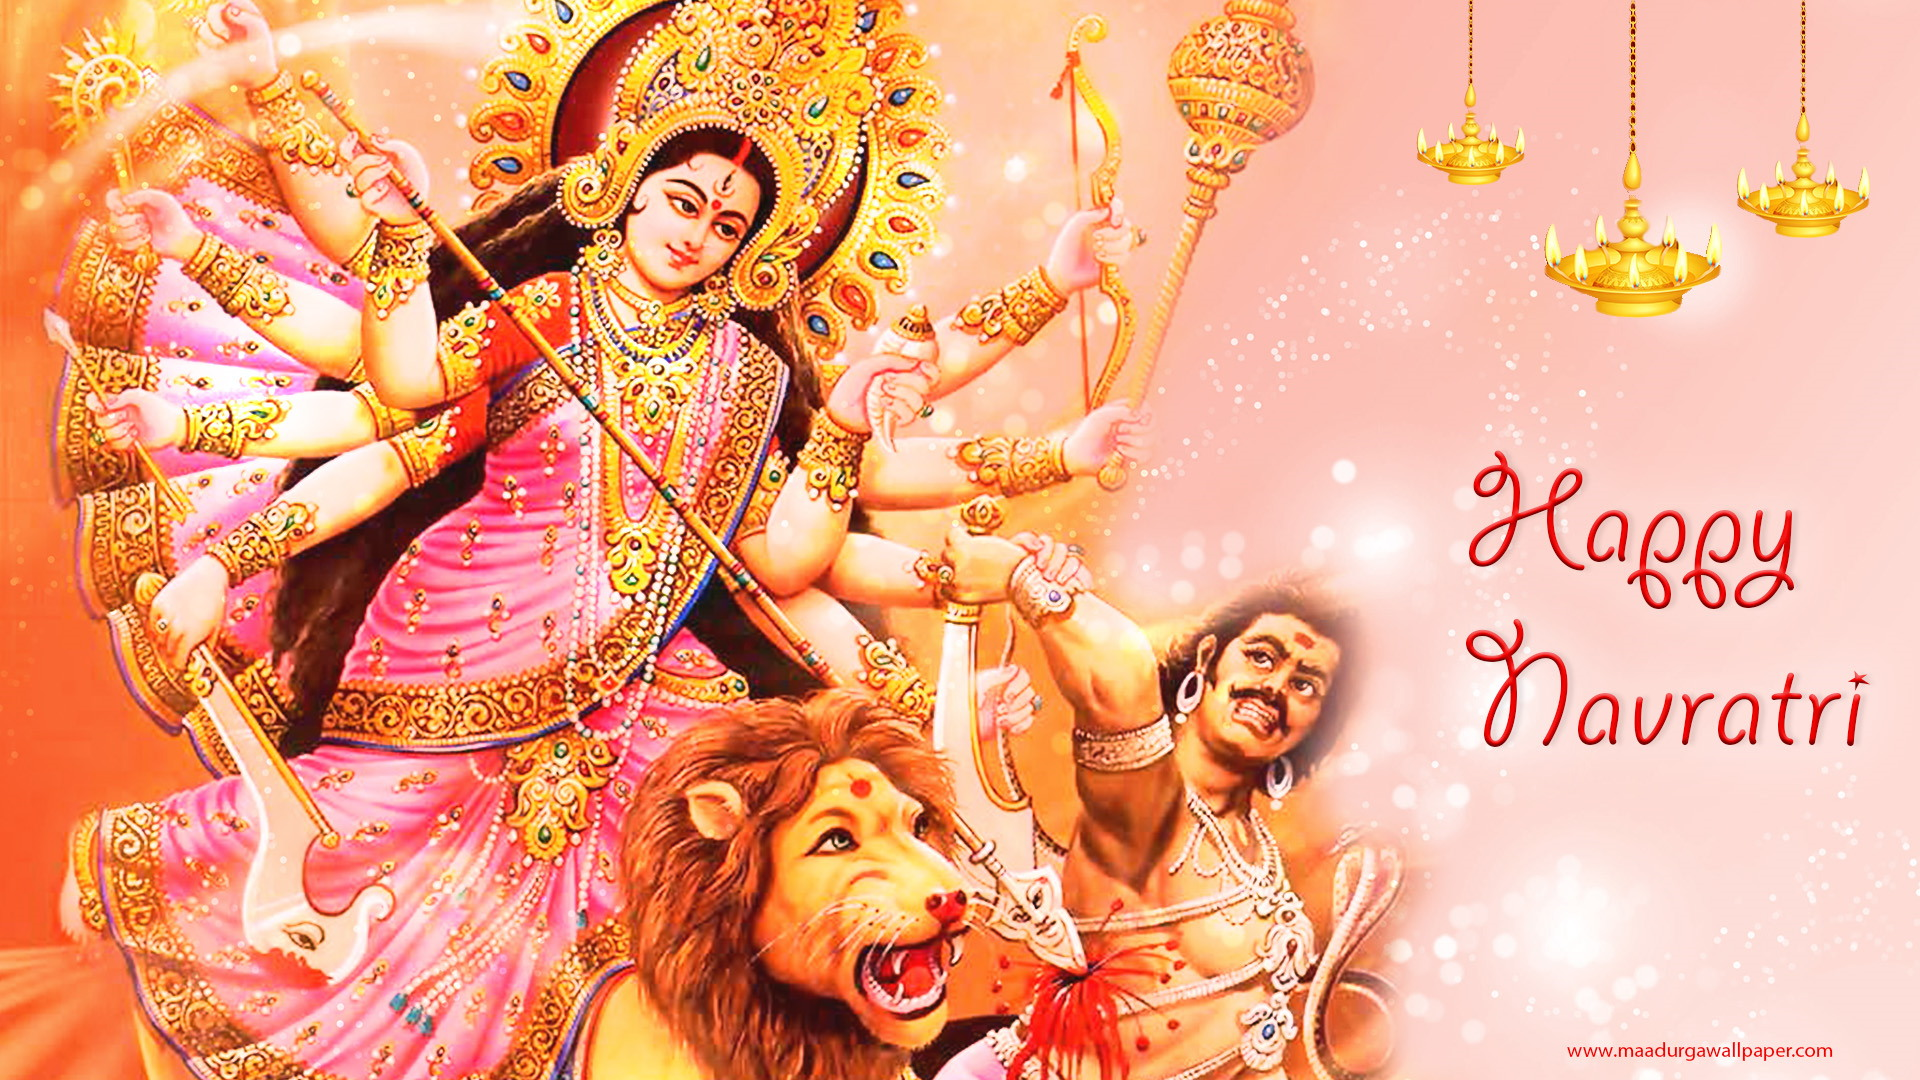 Maa Durga Kill Mahishasur 173997 Hd Wallpaper Backgrounds Download